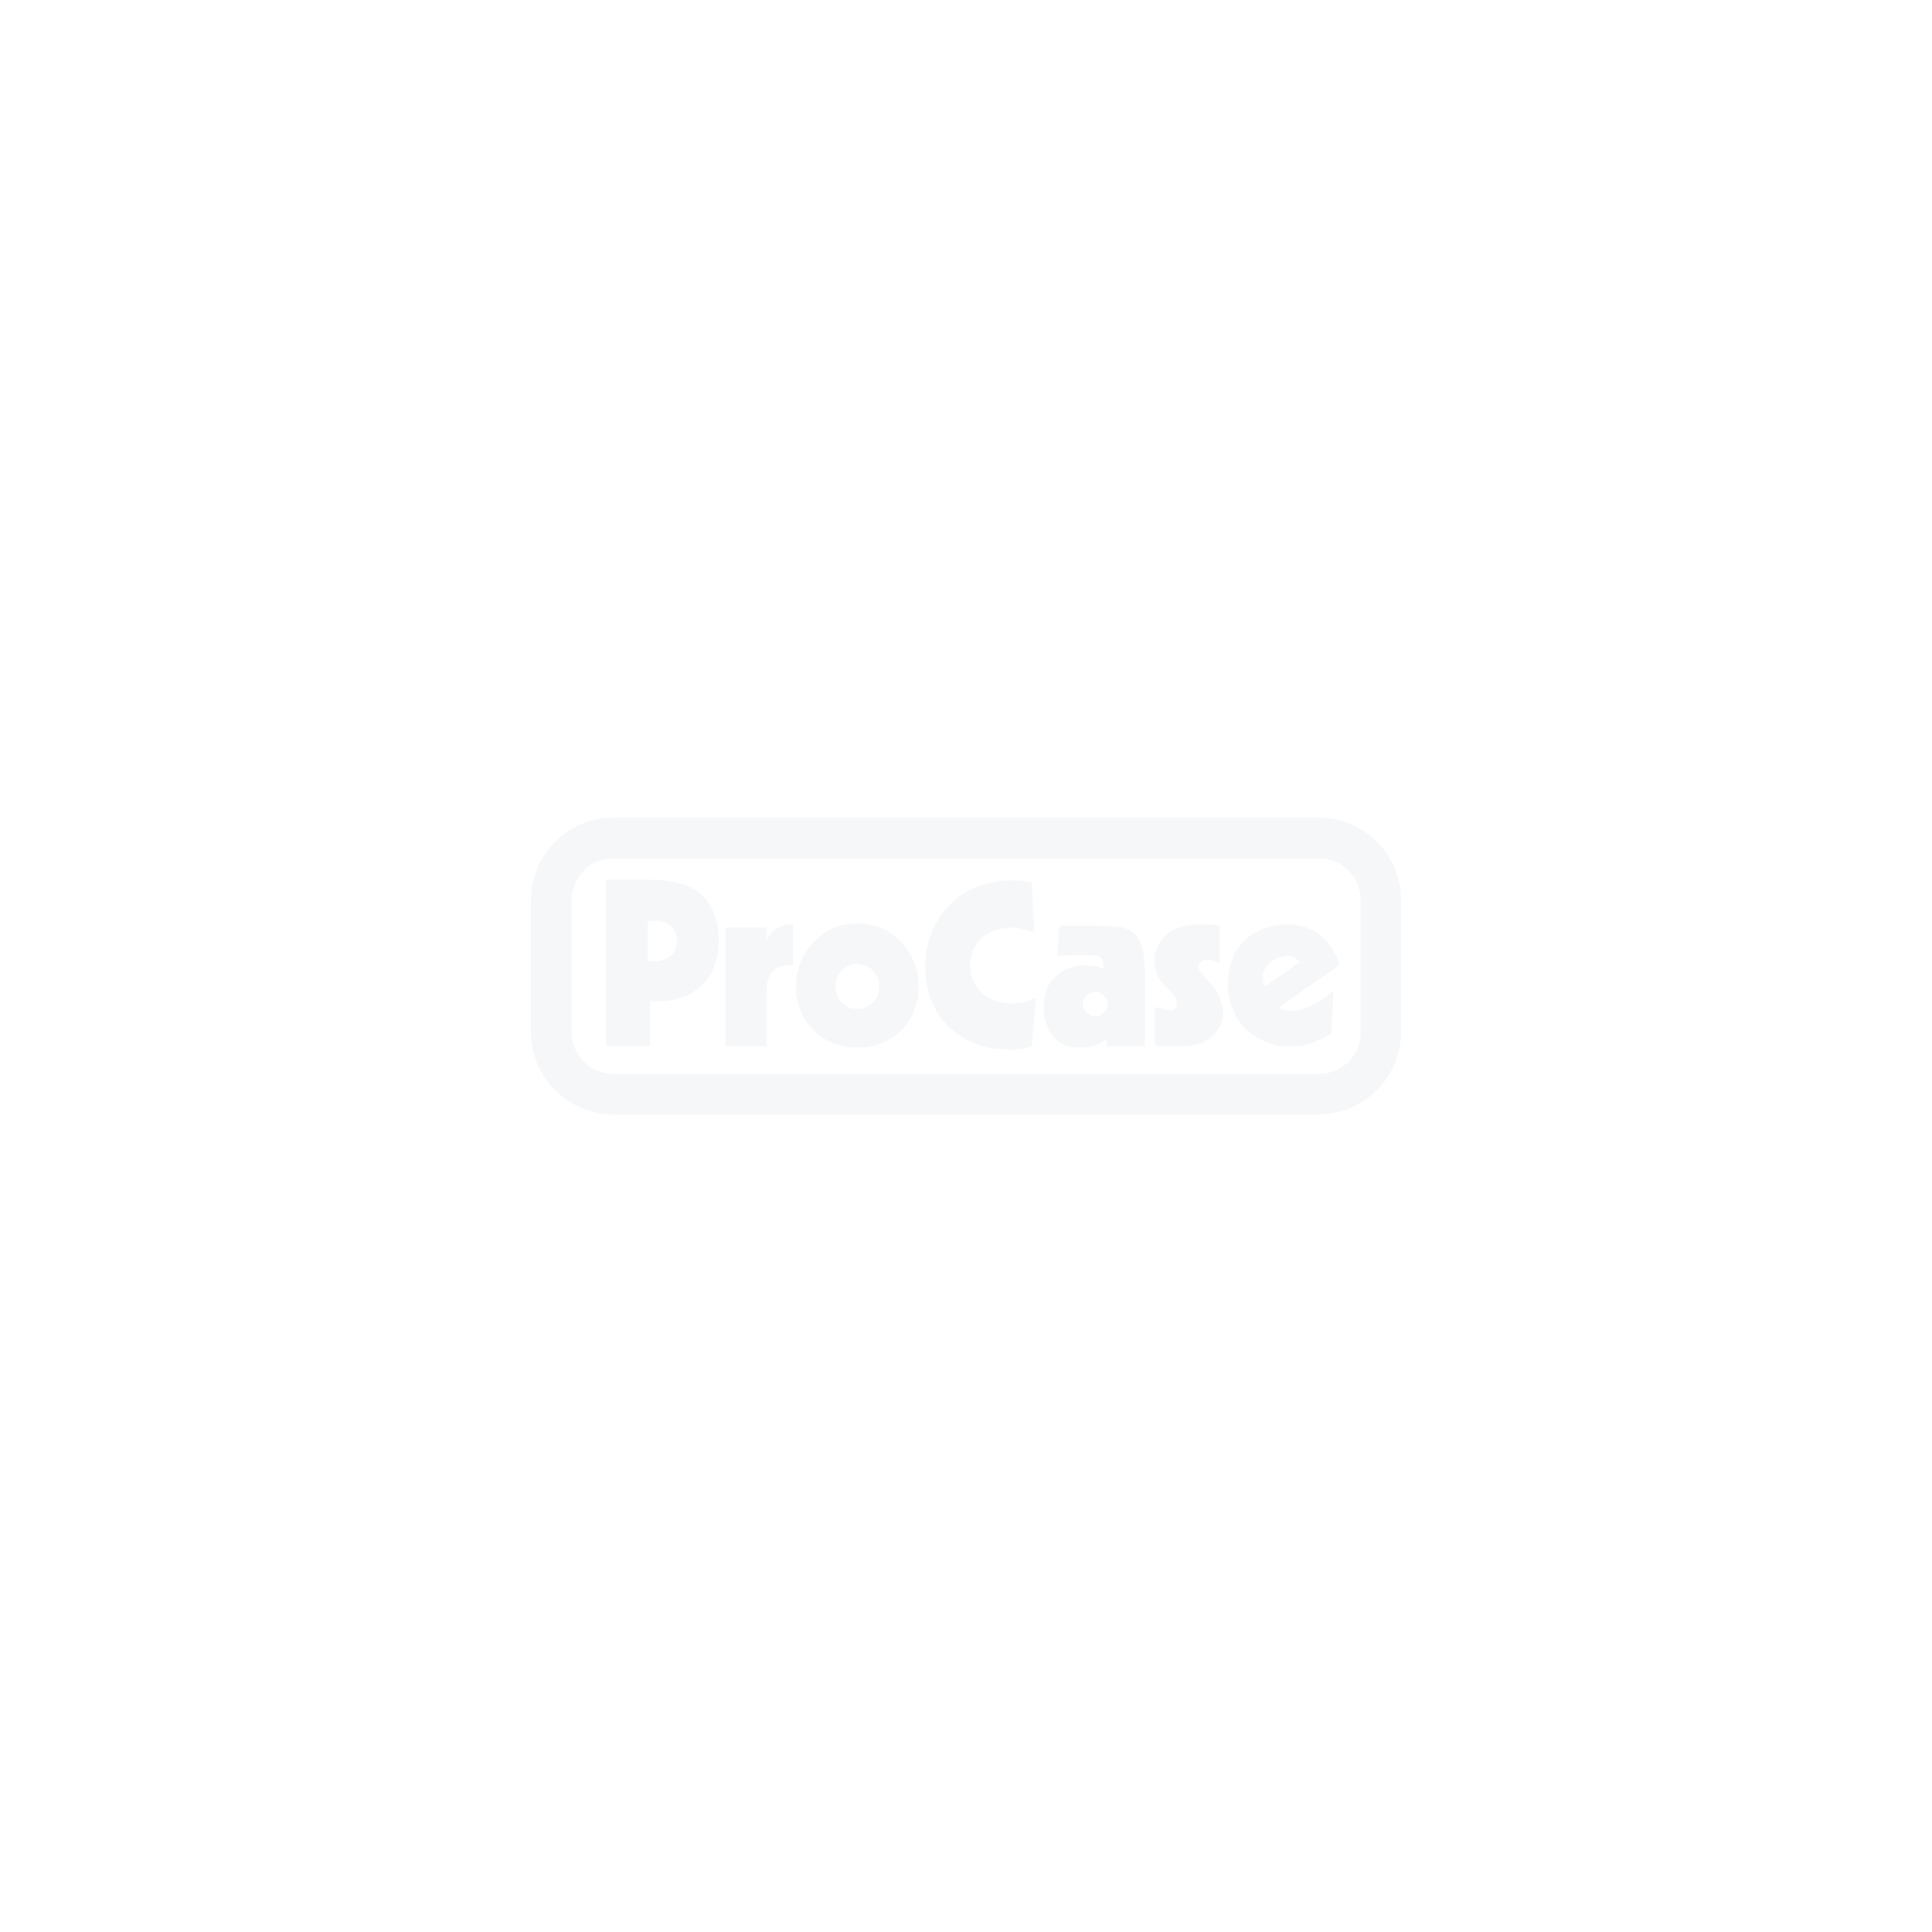 Flightcase für 1 St. Eyevis Eye-LCD-7000-LE-500/700